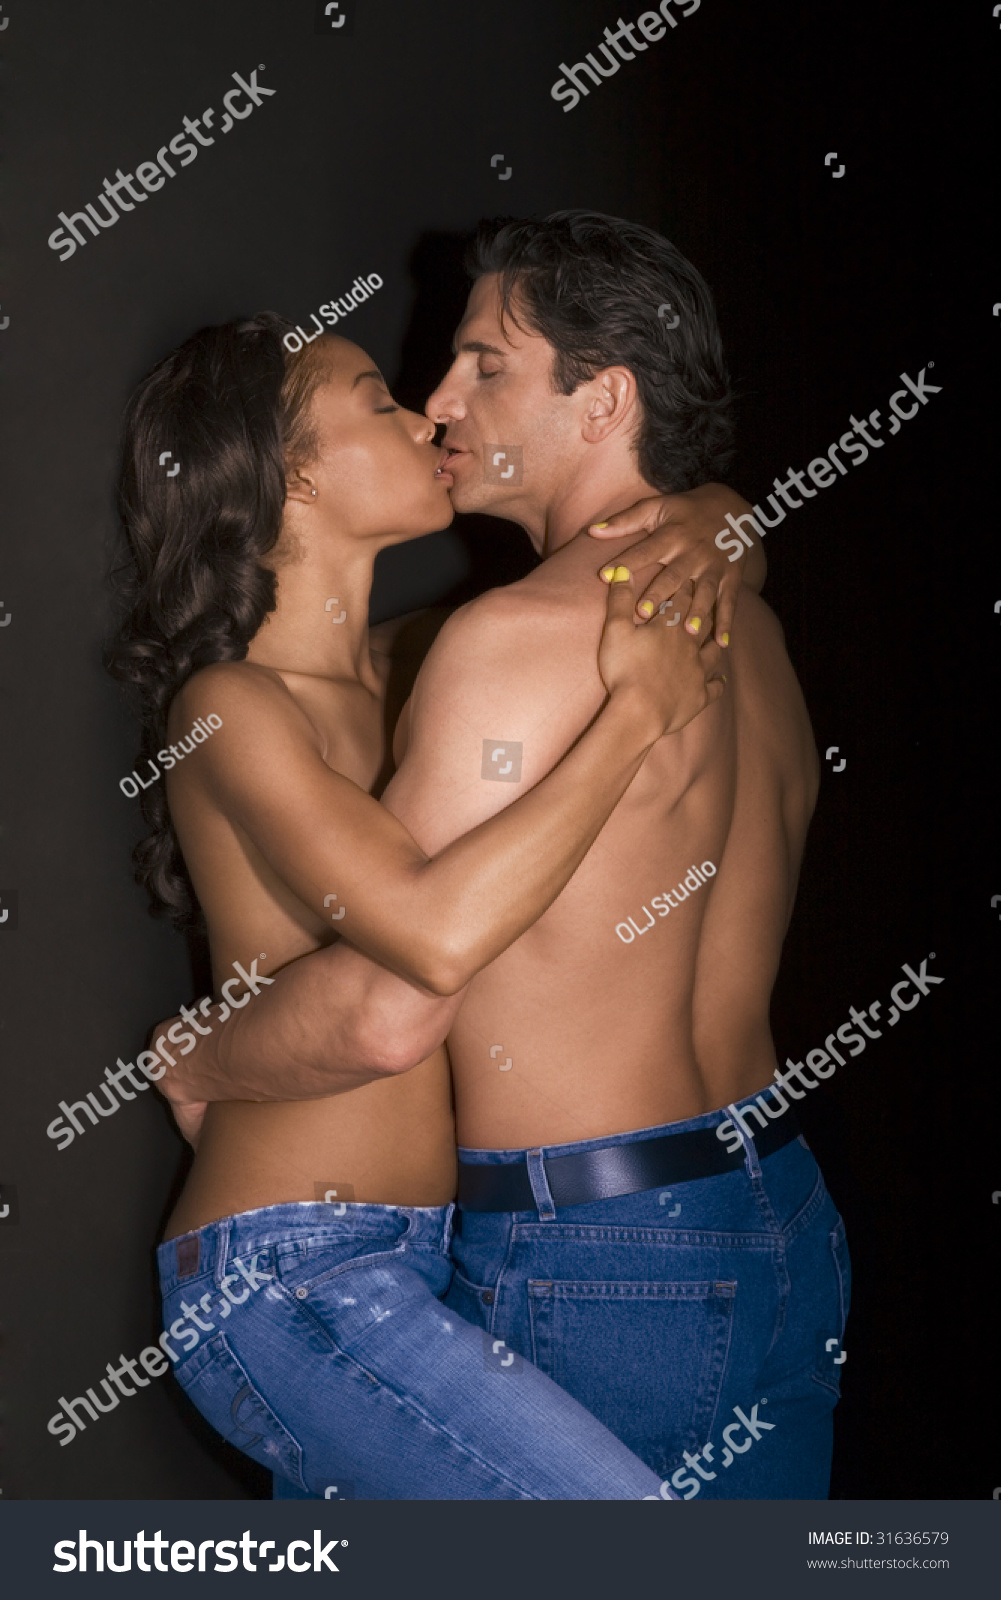 loving affectionate nude interracial heterosexual couple stock photo